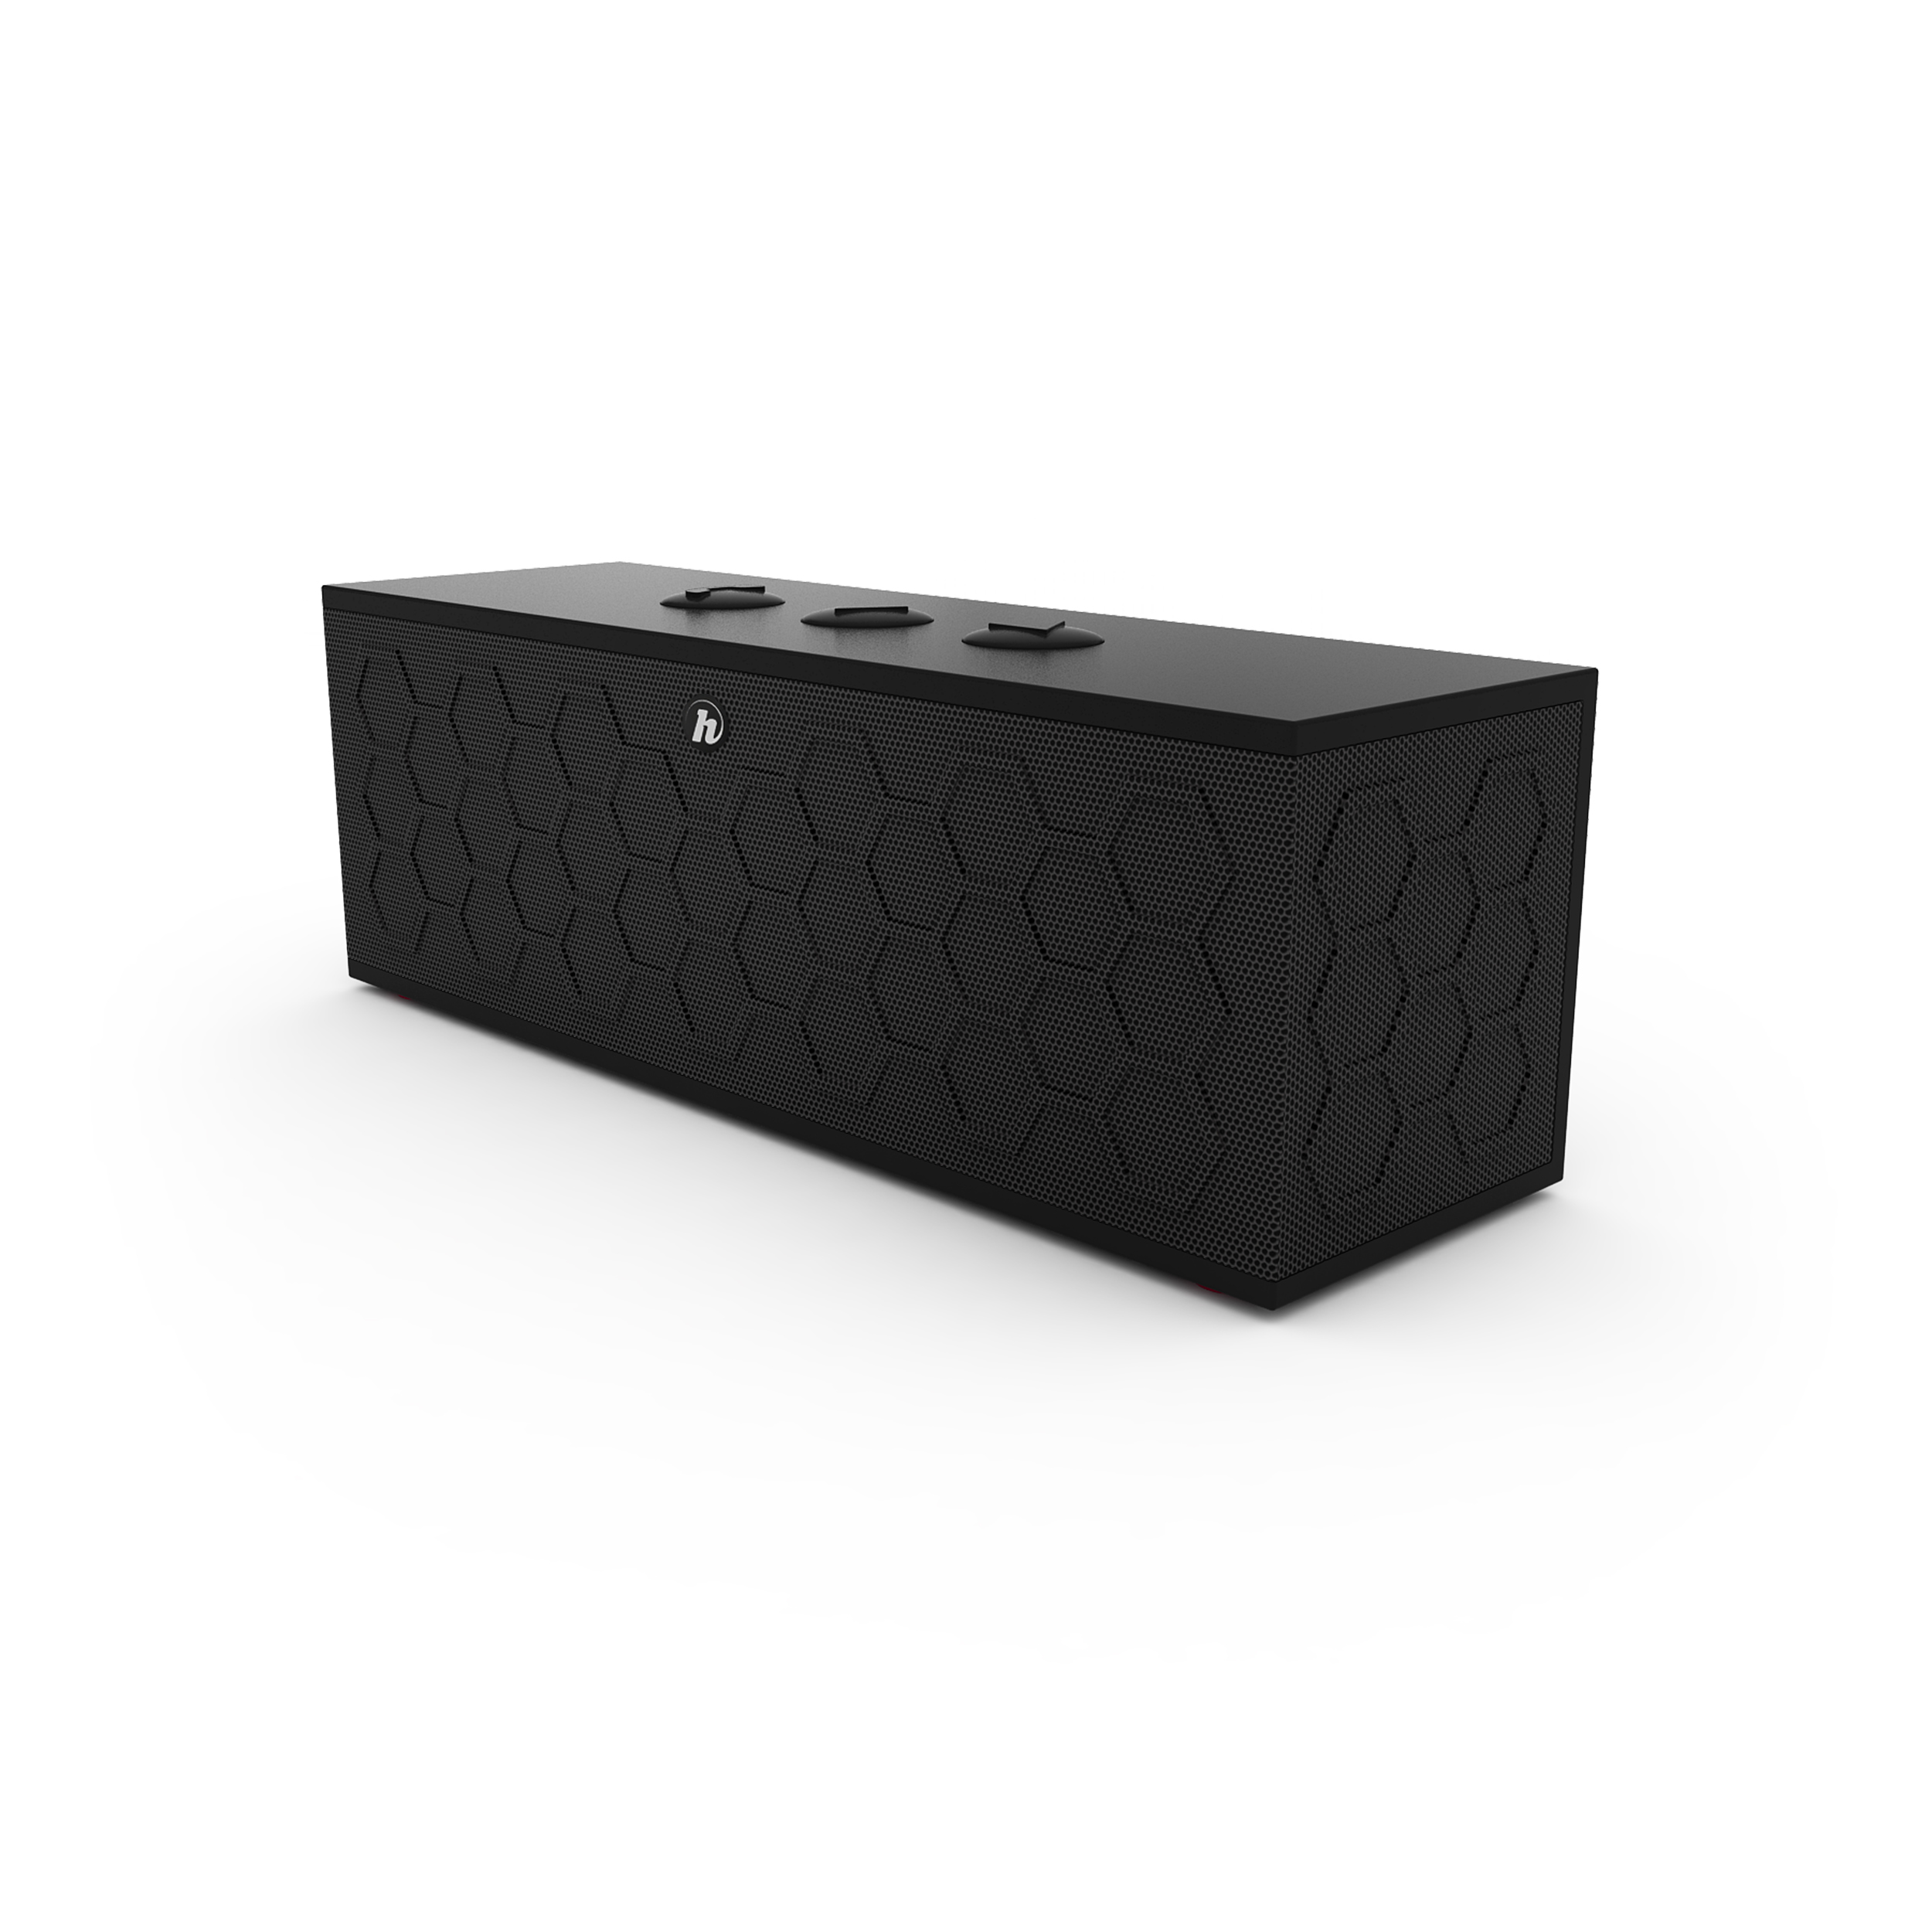 Hipstreet Amplitude Bluetooth Amplified Speaker System